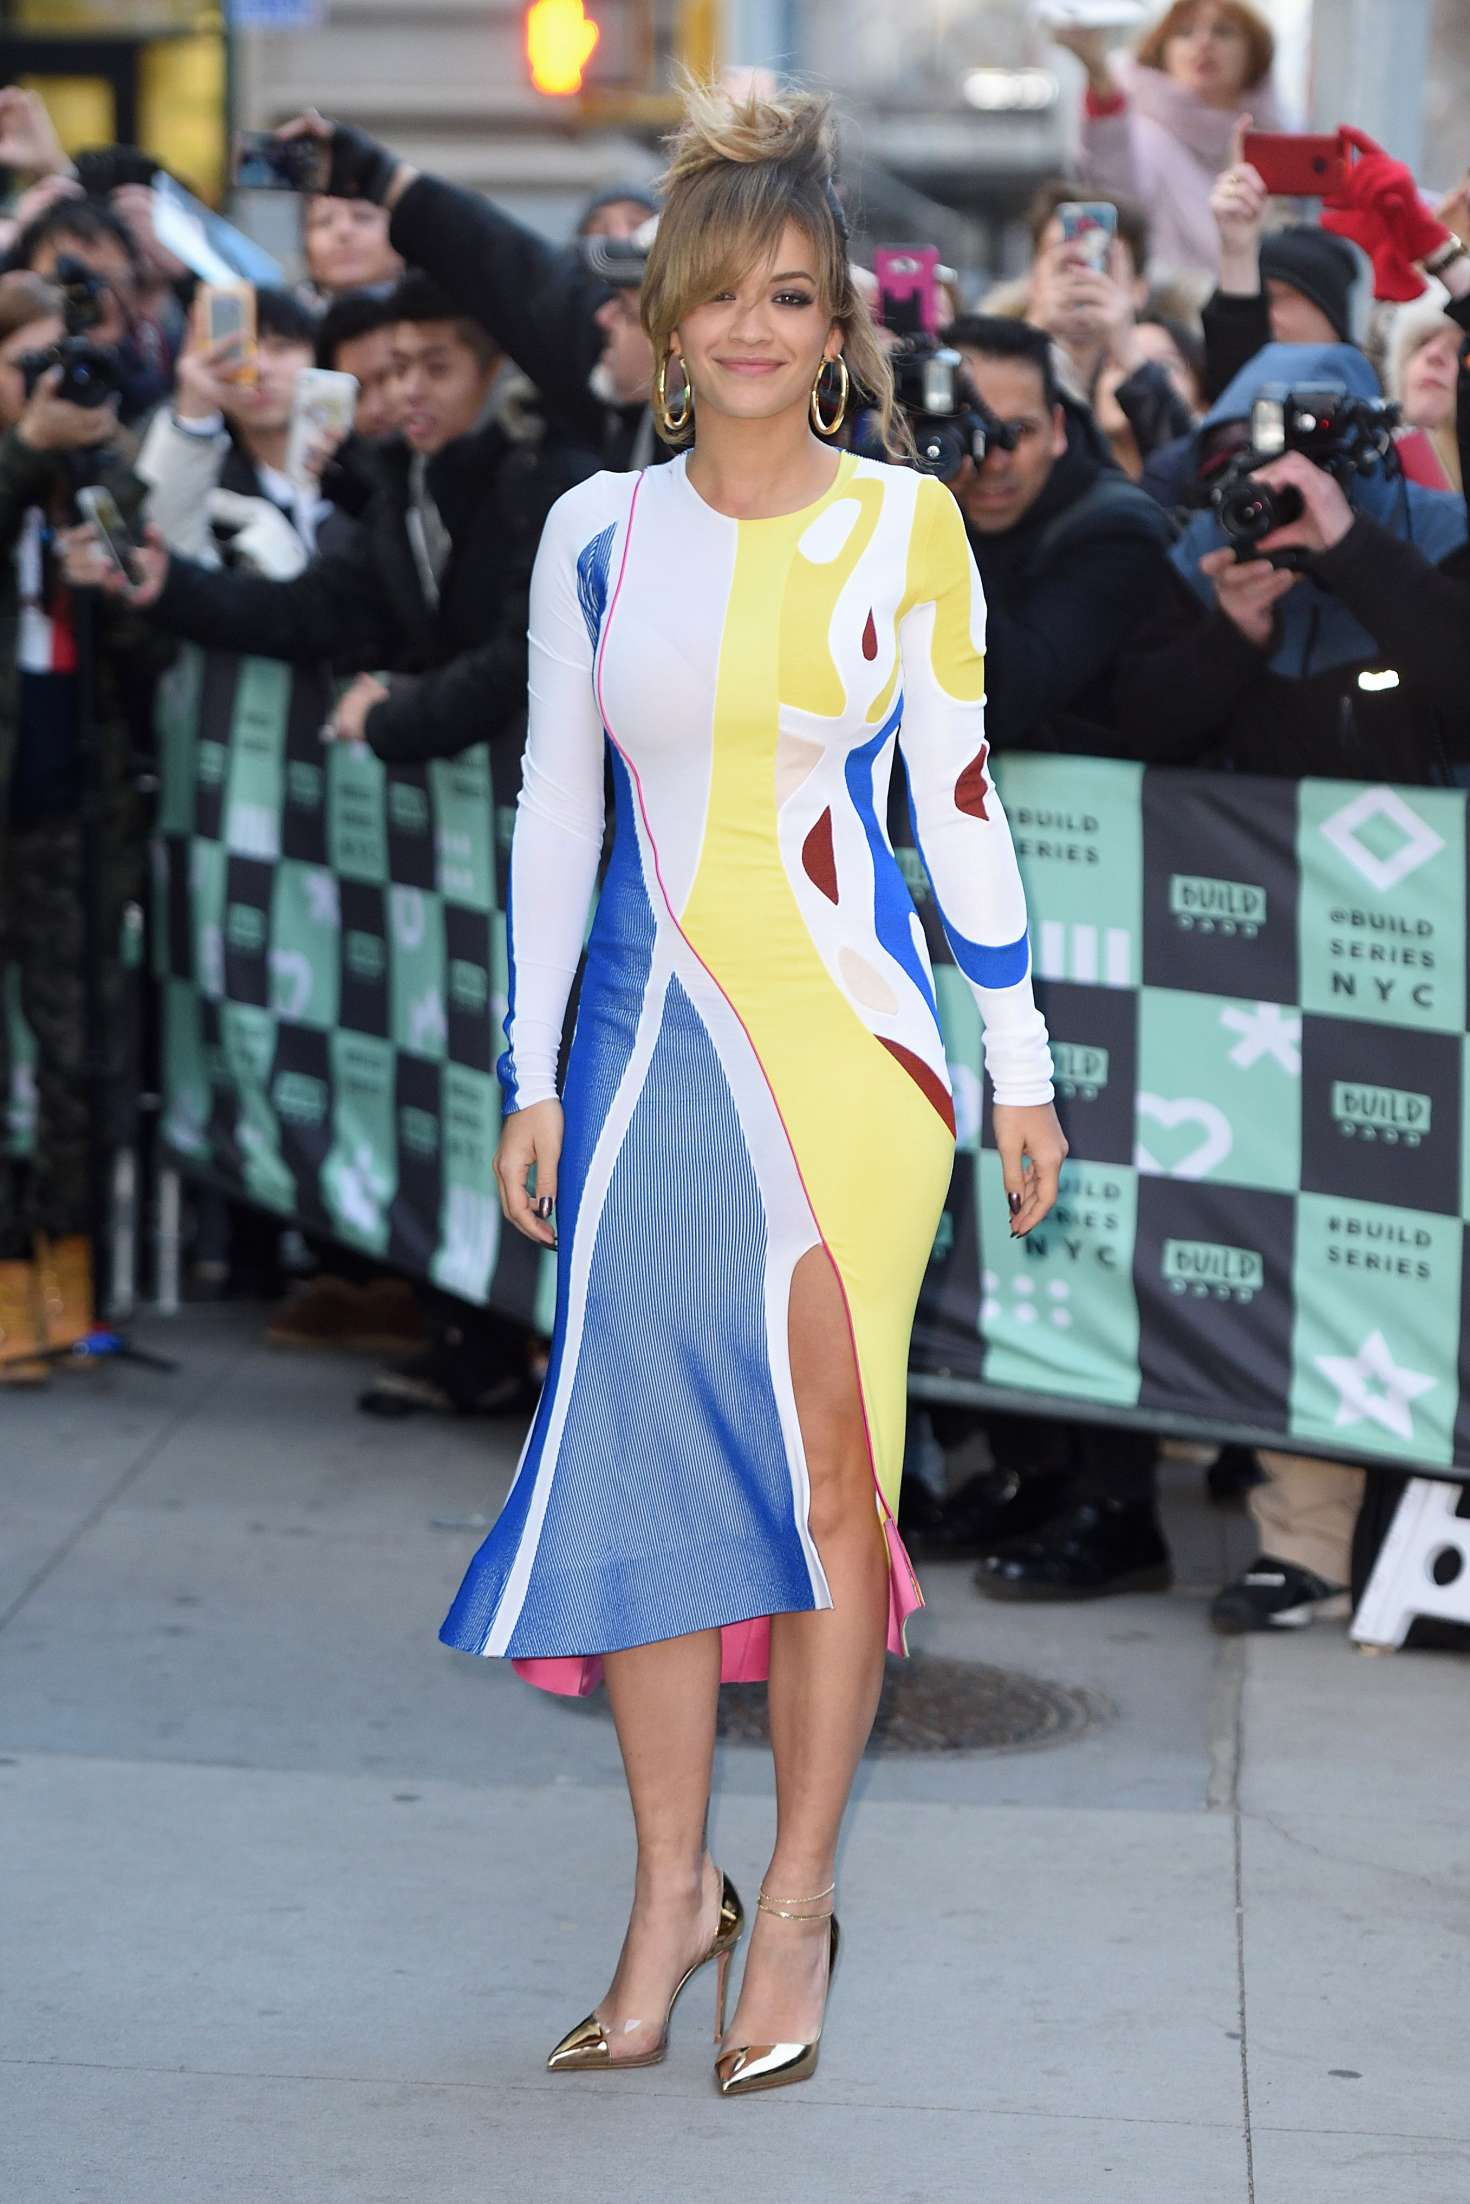 Rita Ora 2017 : Rita Ora: Arrives at AOL Build in NYC -03